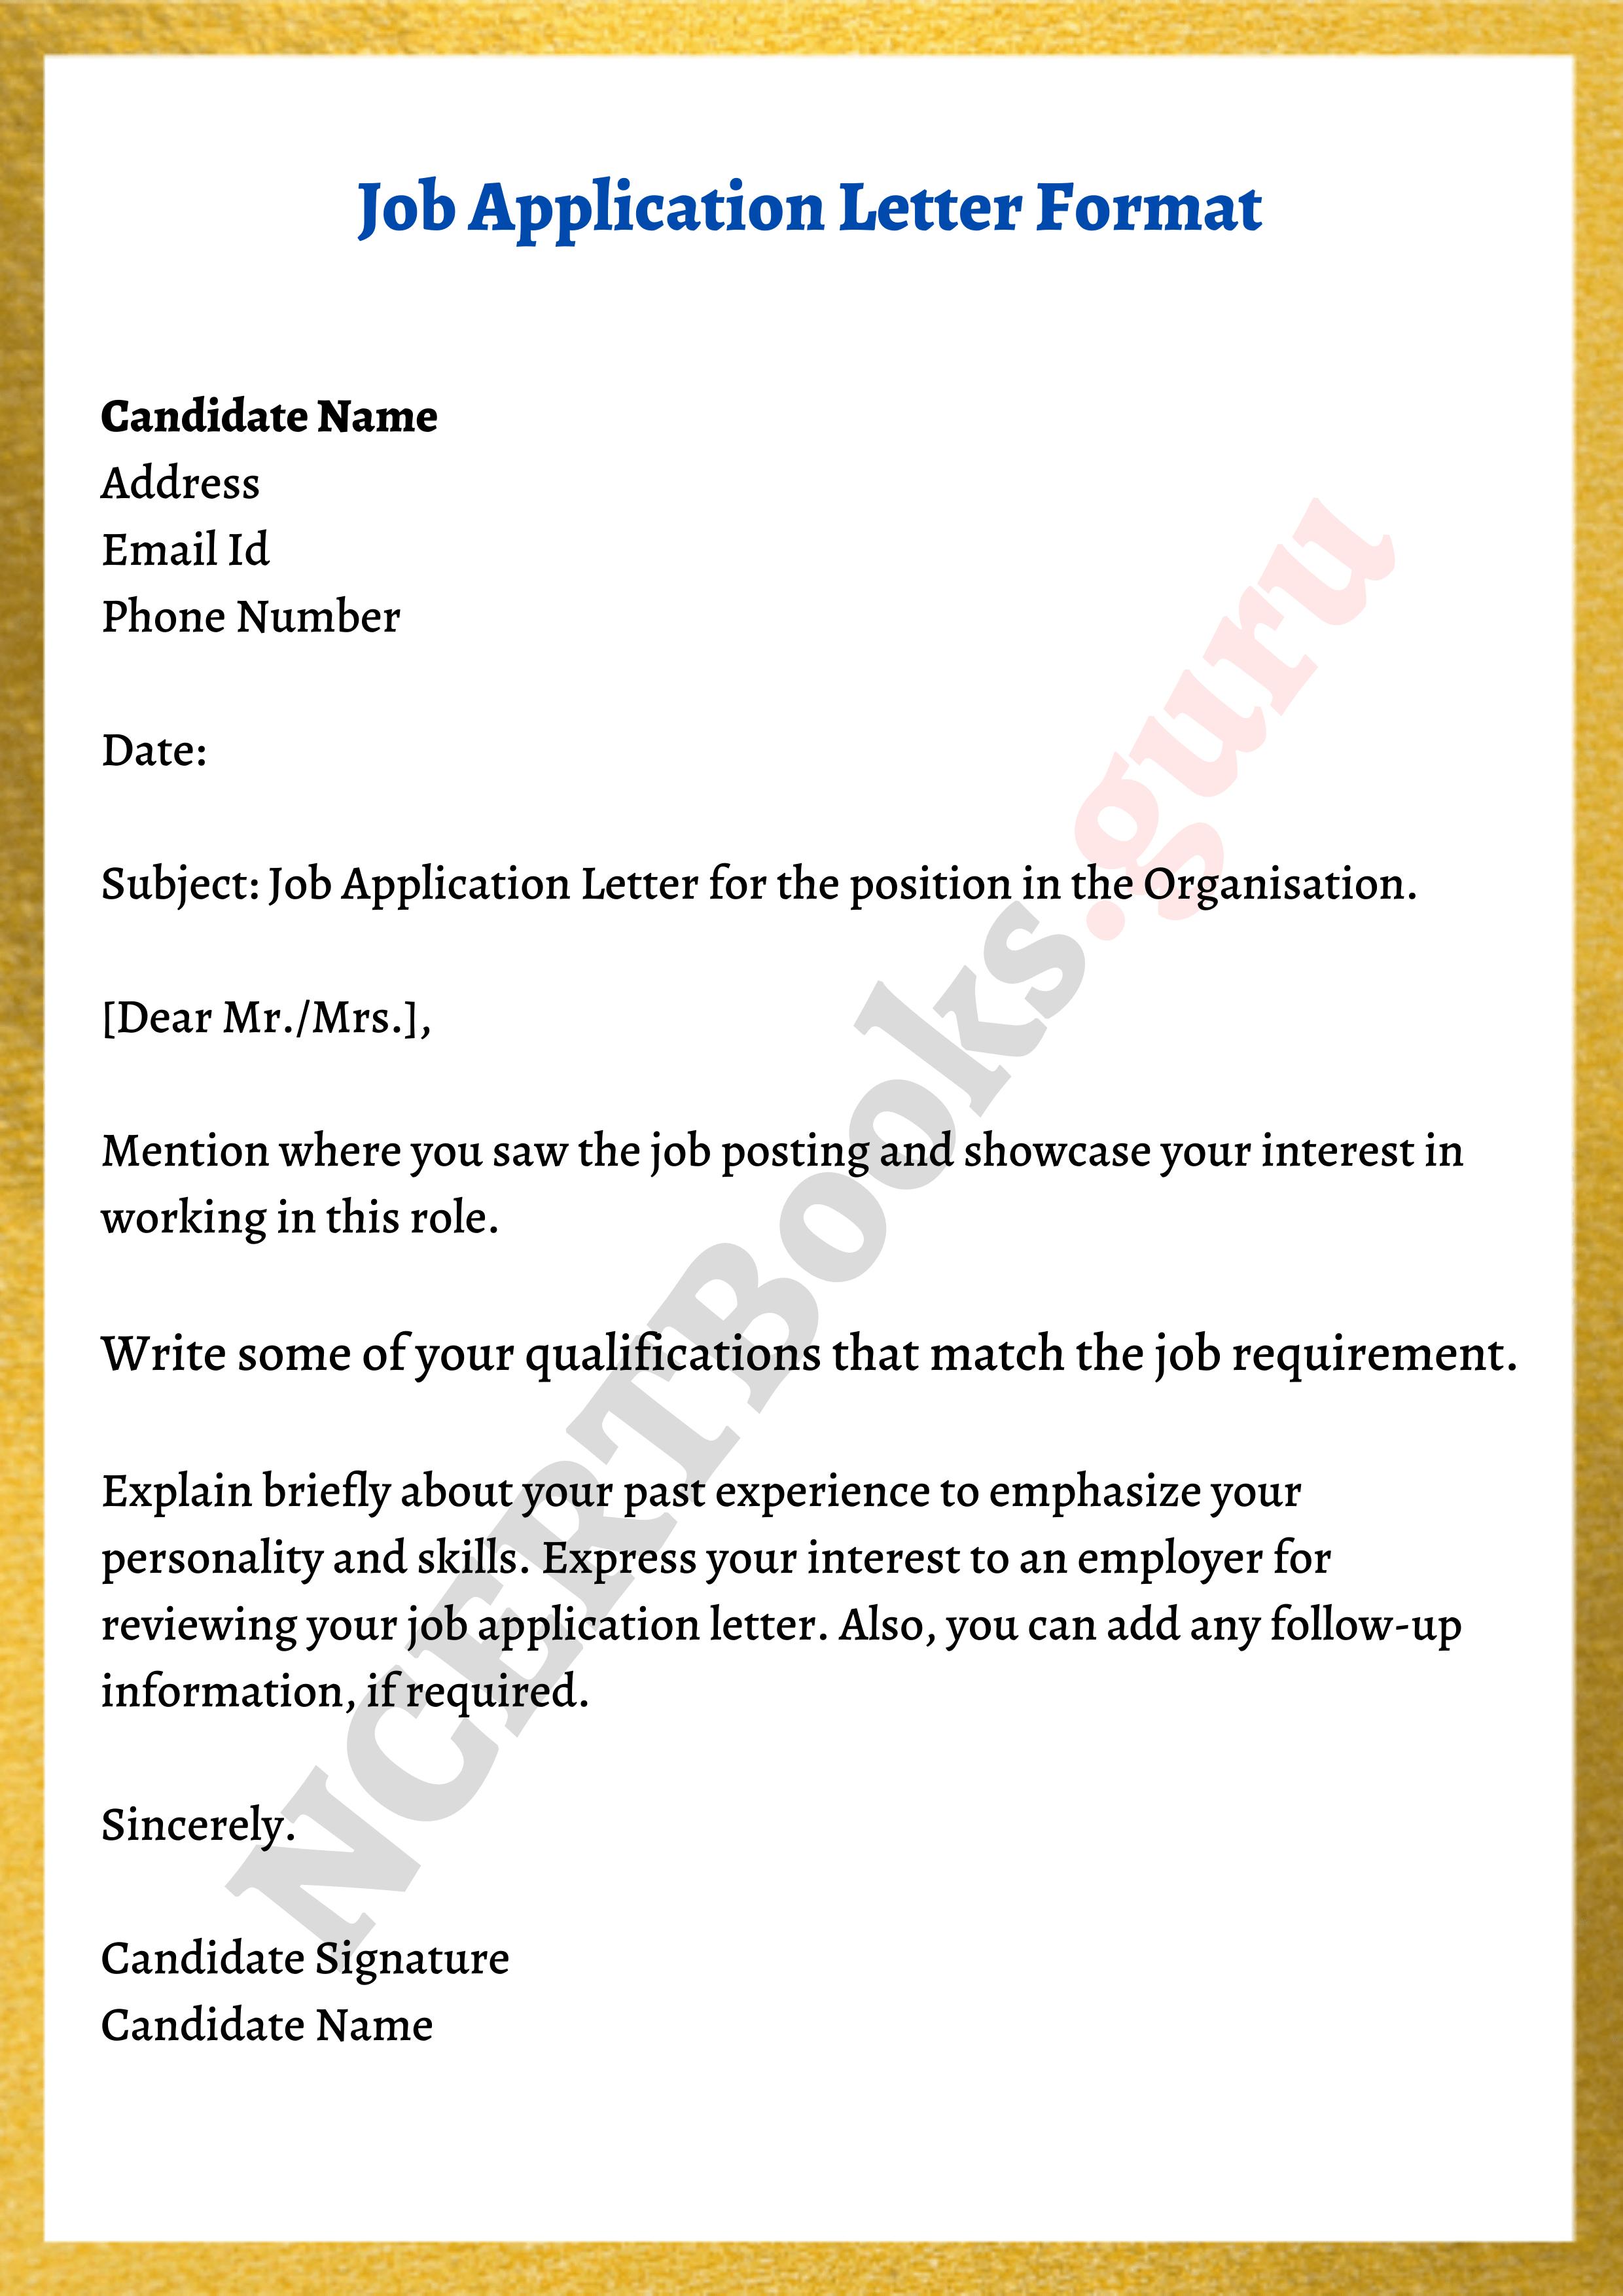 Job Application Letter Format Samples